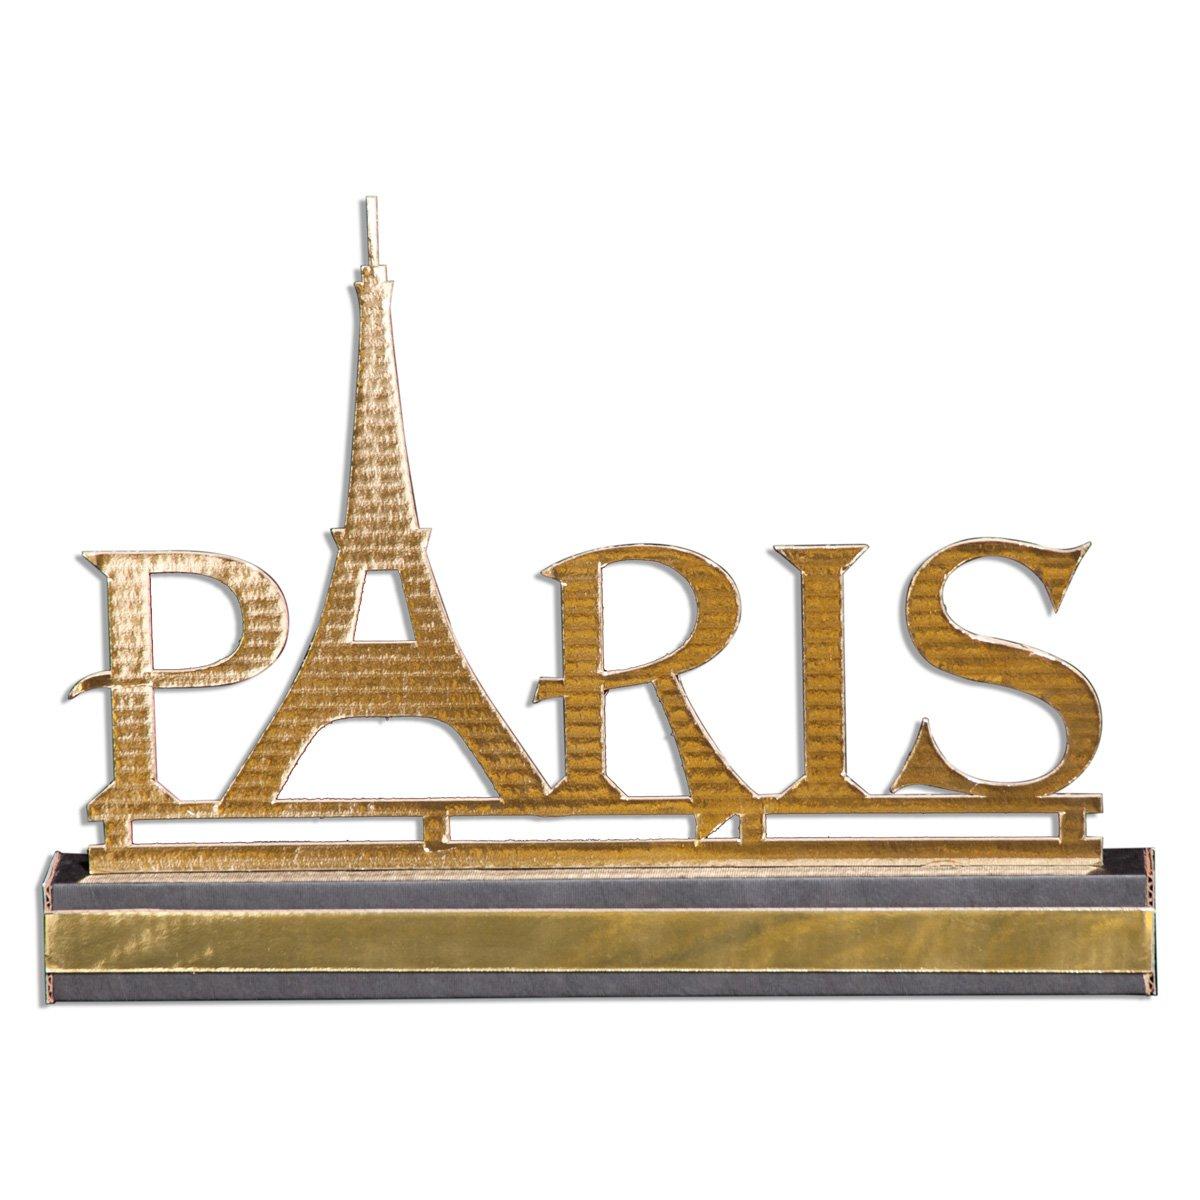 Chic Paris Centerpiece Kit, Set of Four, 13 Inches High x 18 Inches Wide Paris Prom Theme Decoration